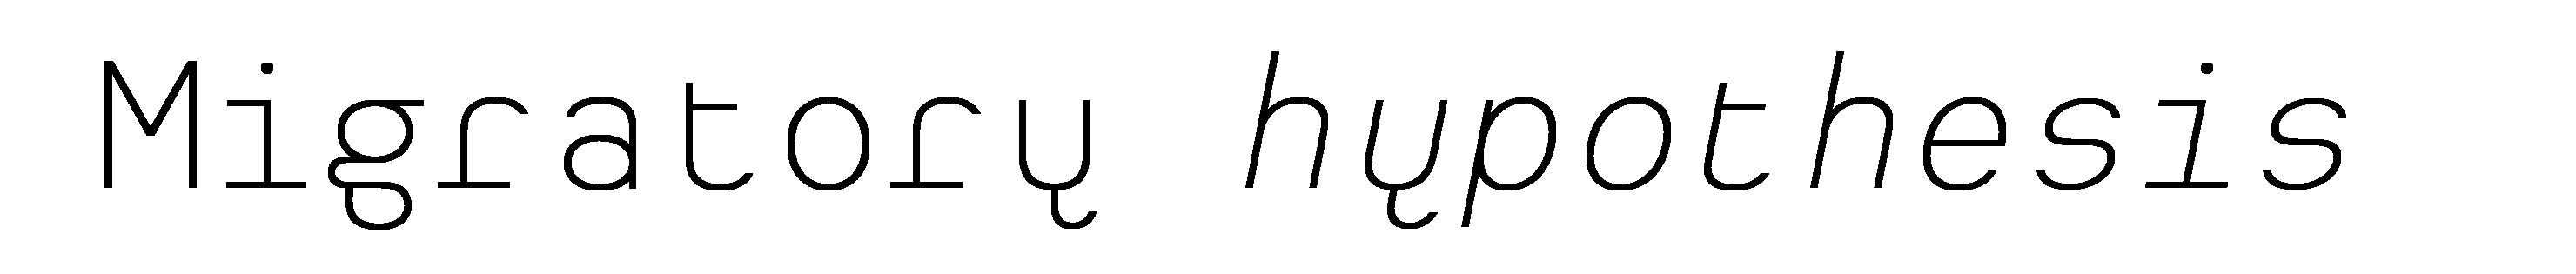 Typeface Heimat Mono D01 Atlas Font Foundry